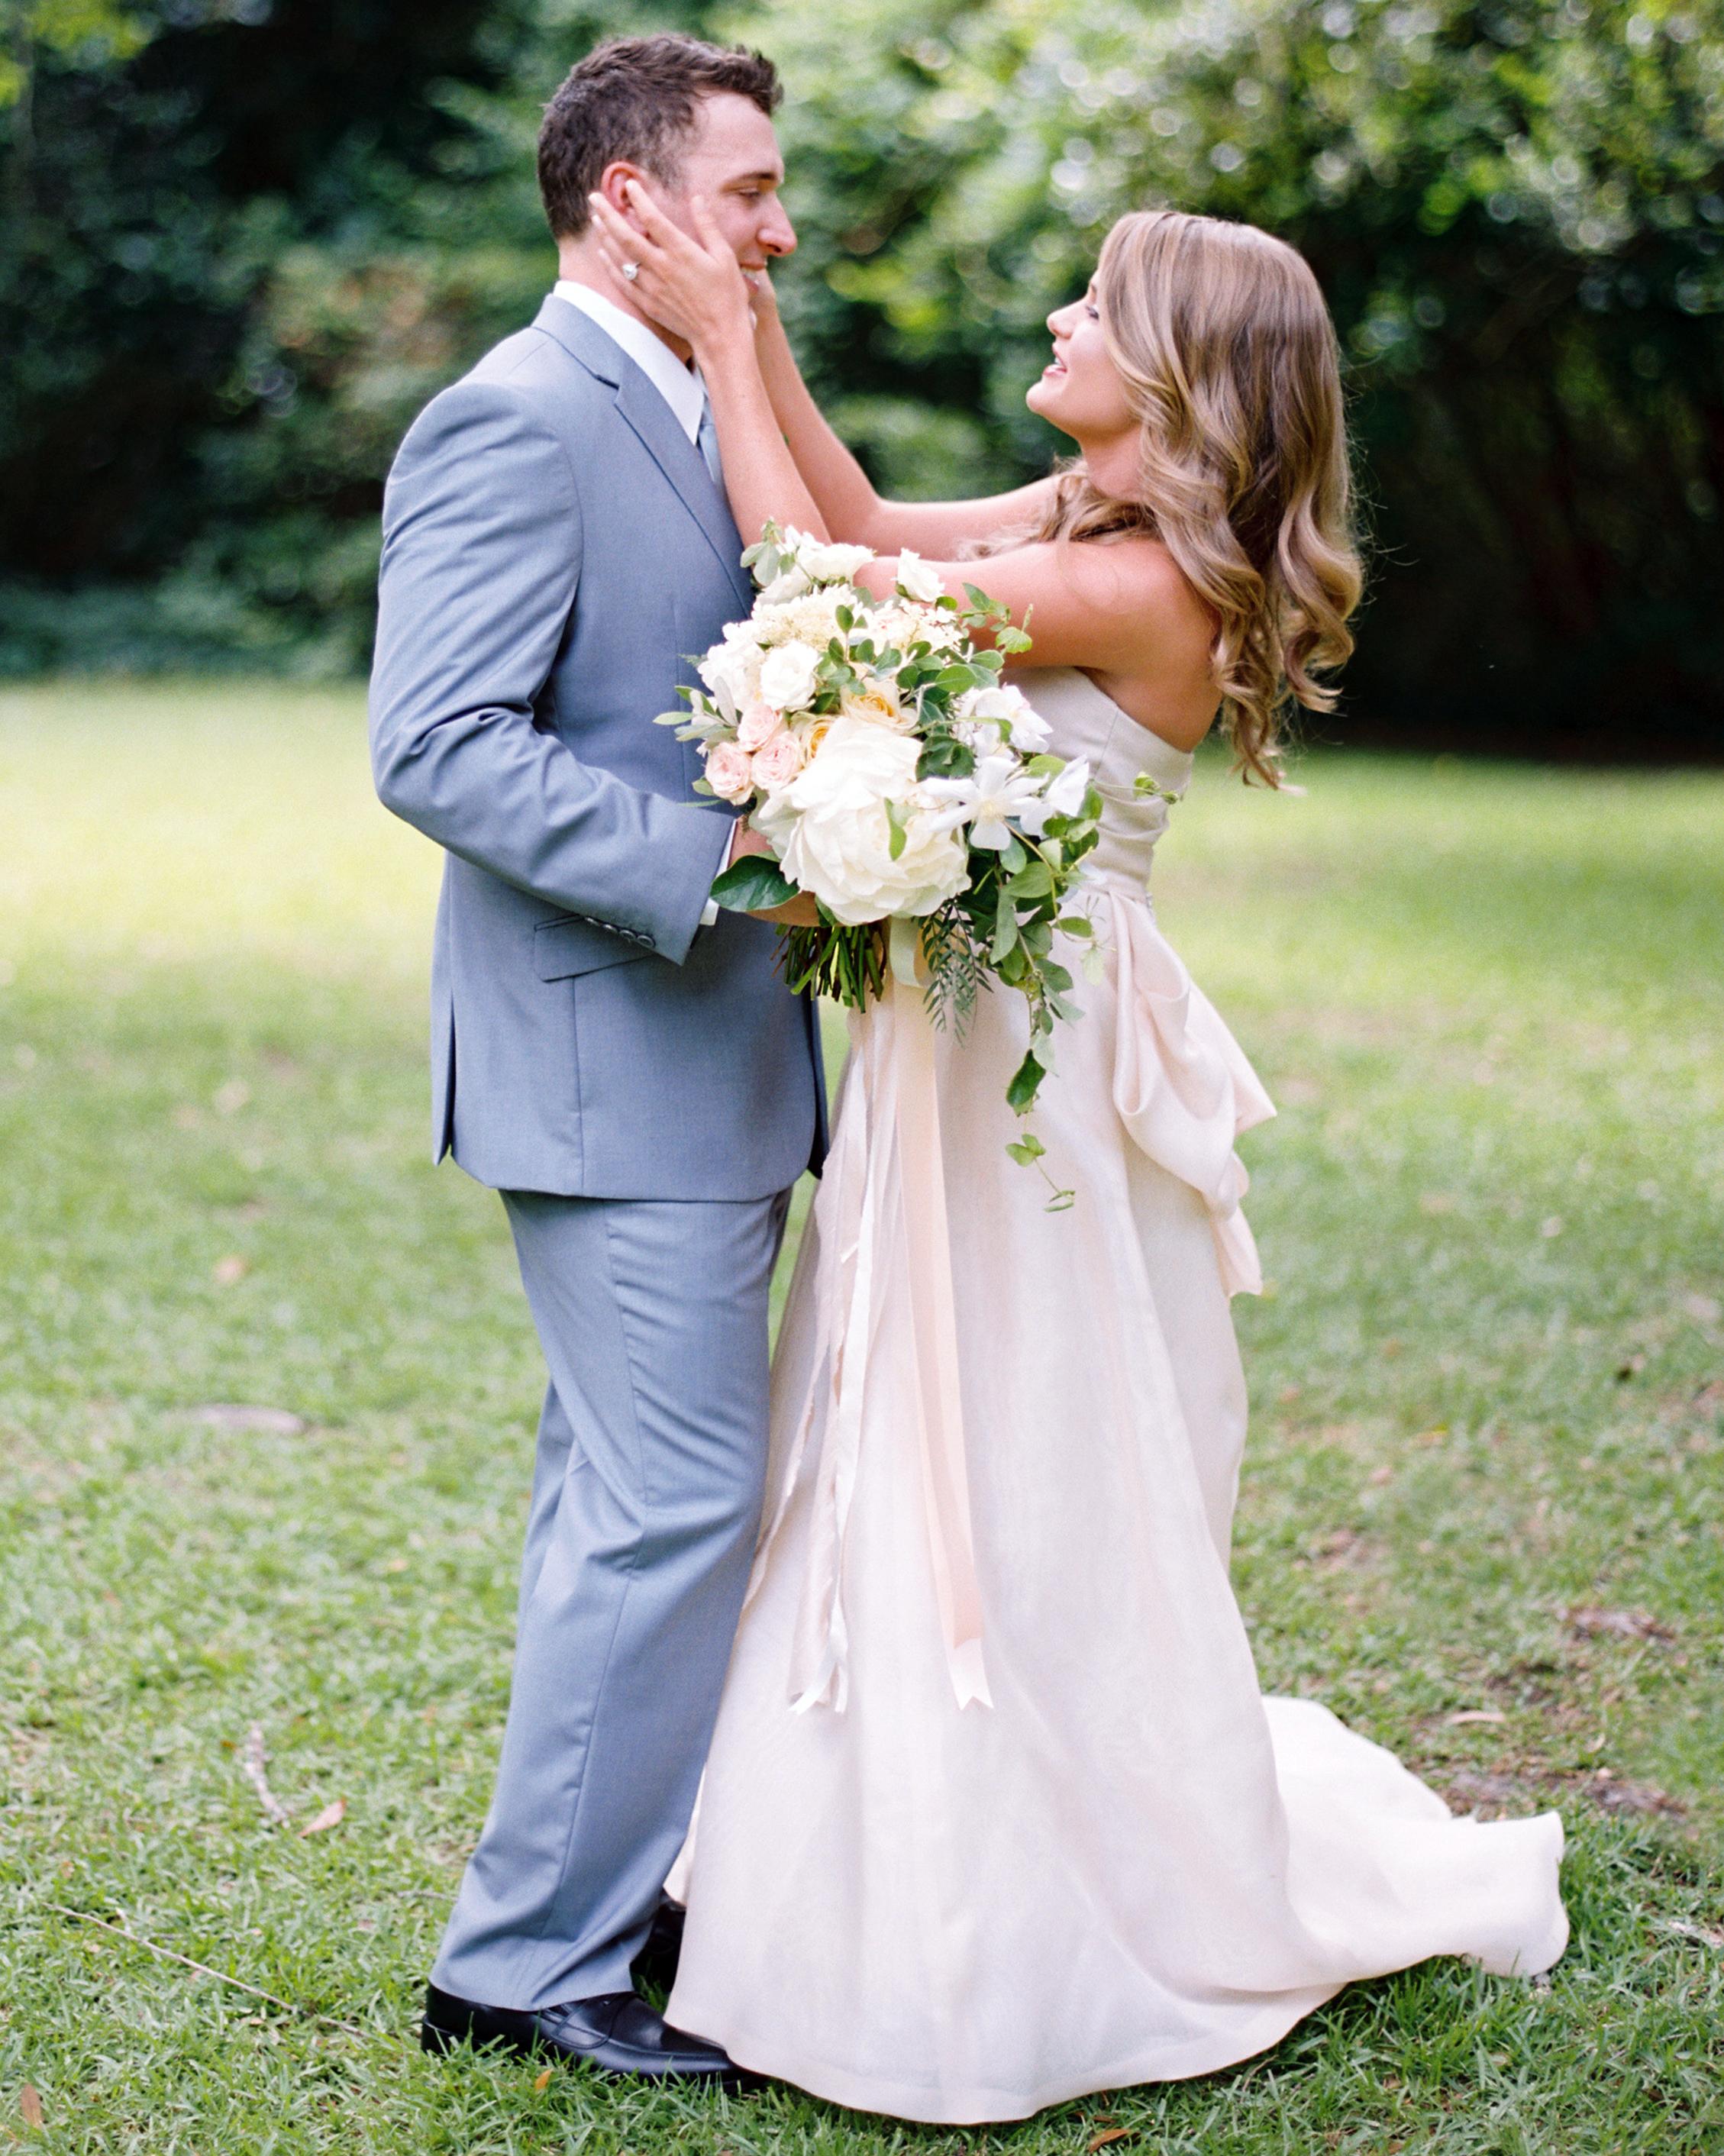 irby-adam-wedding-firstlook-88-s111660-1014.jpg